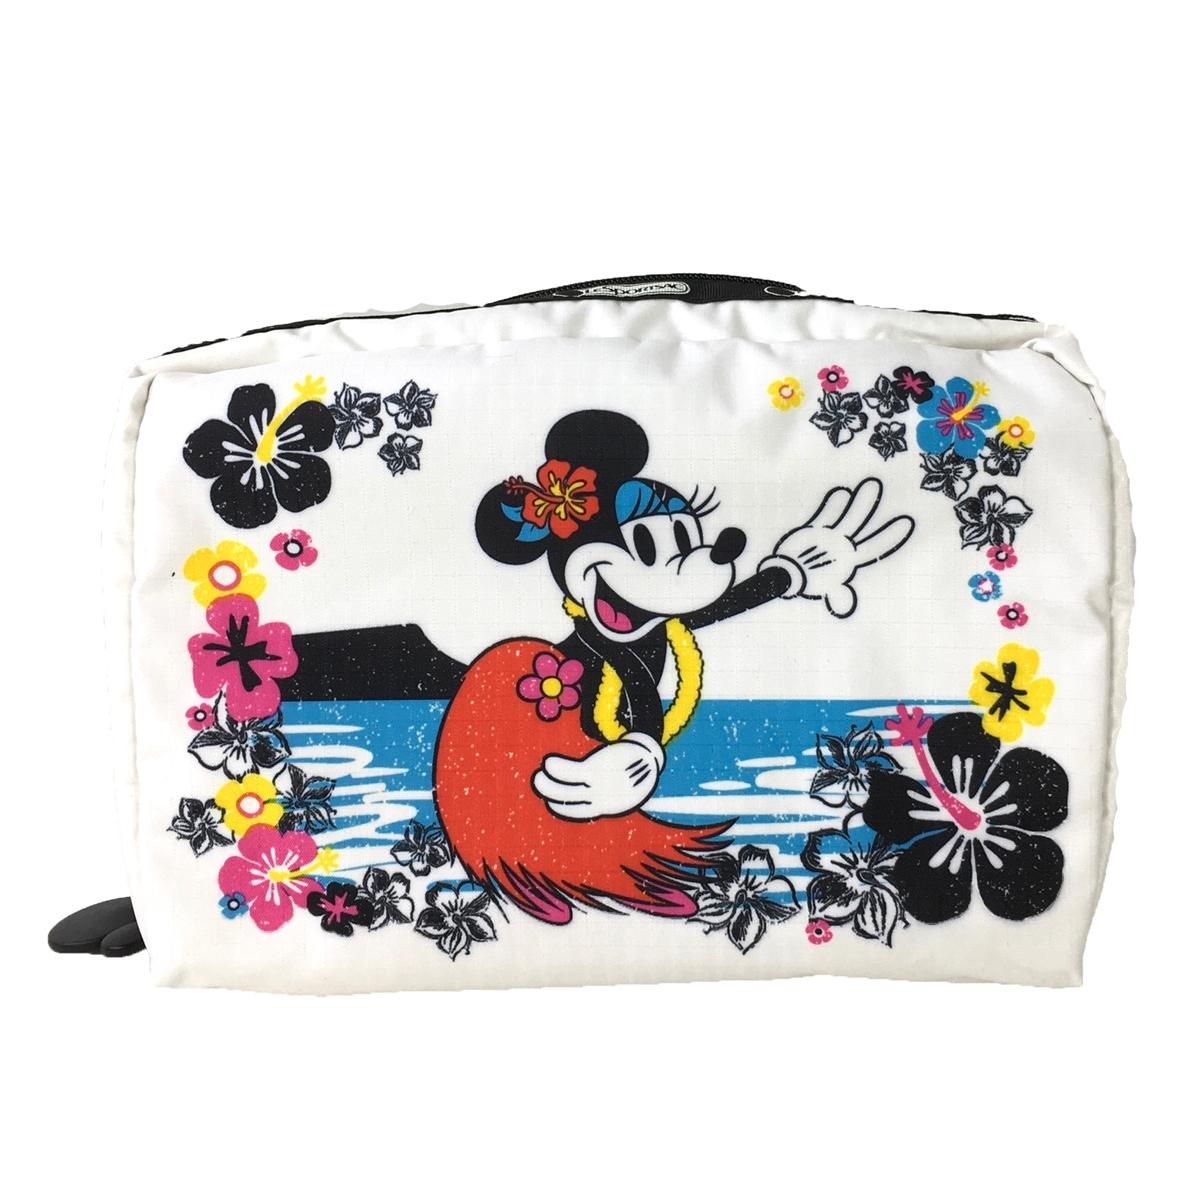 a1e711c31c LeSportsac x Disney Minnie Mouse Extra Large Rectangular Cosmetic ...